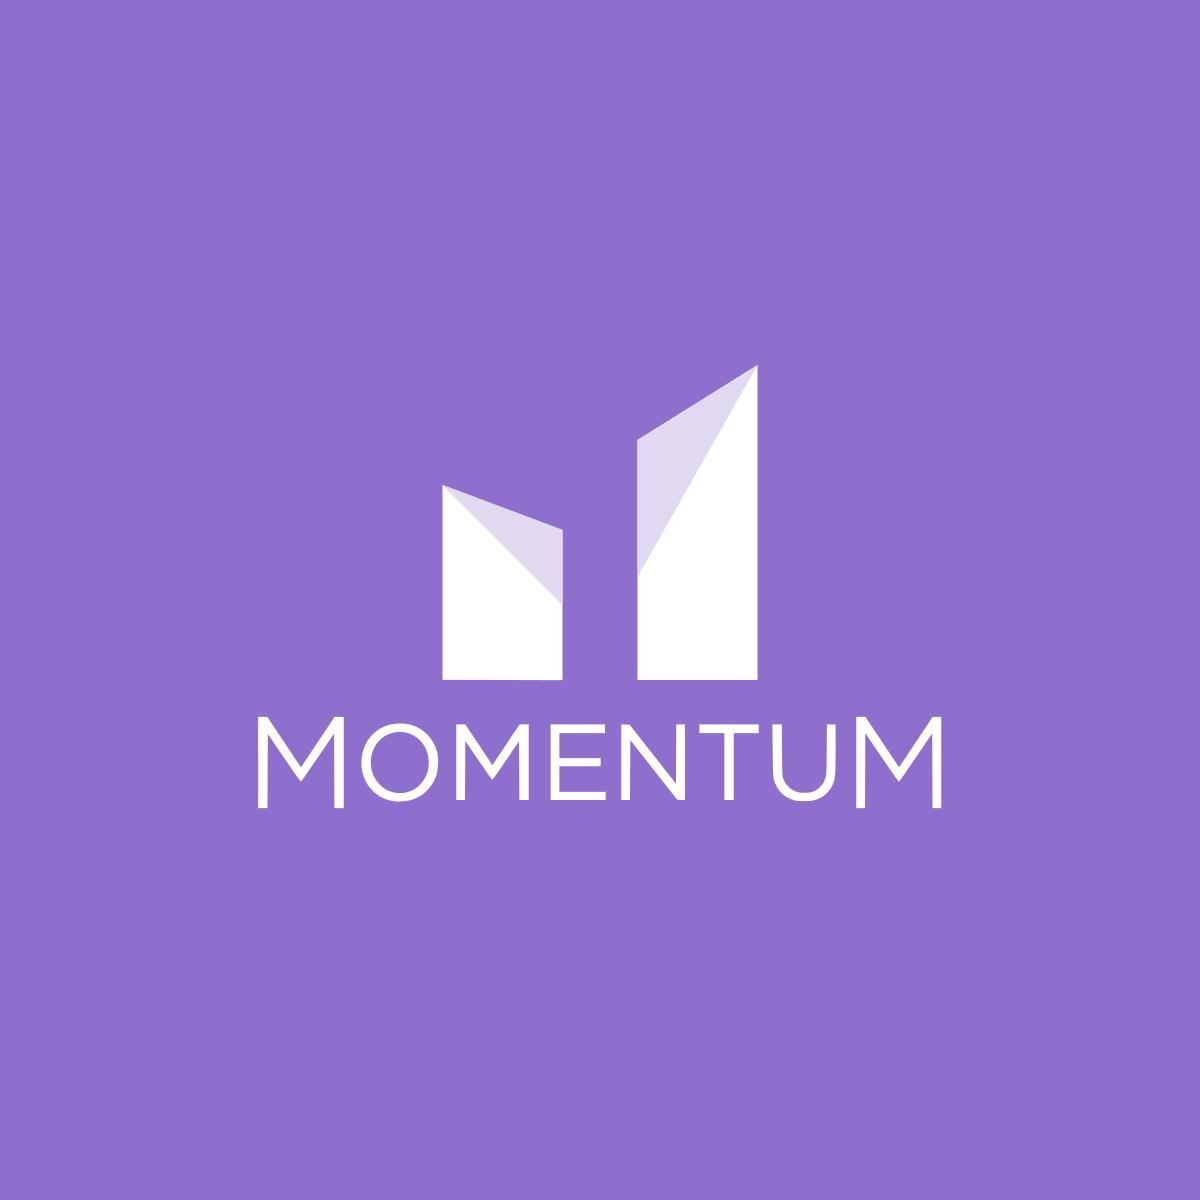 Momentum Movement.